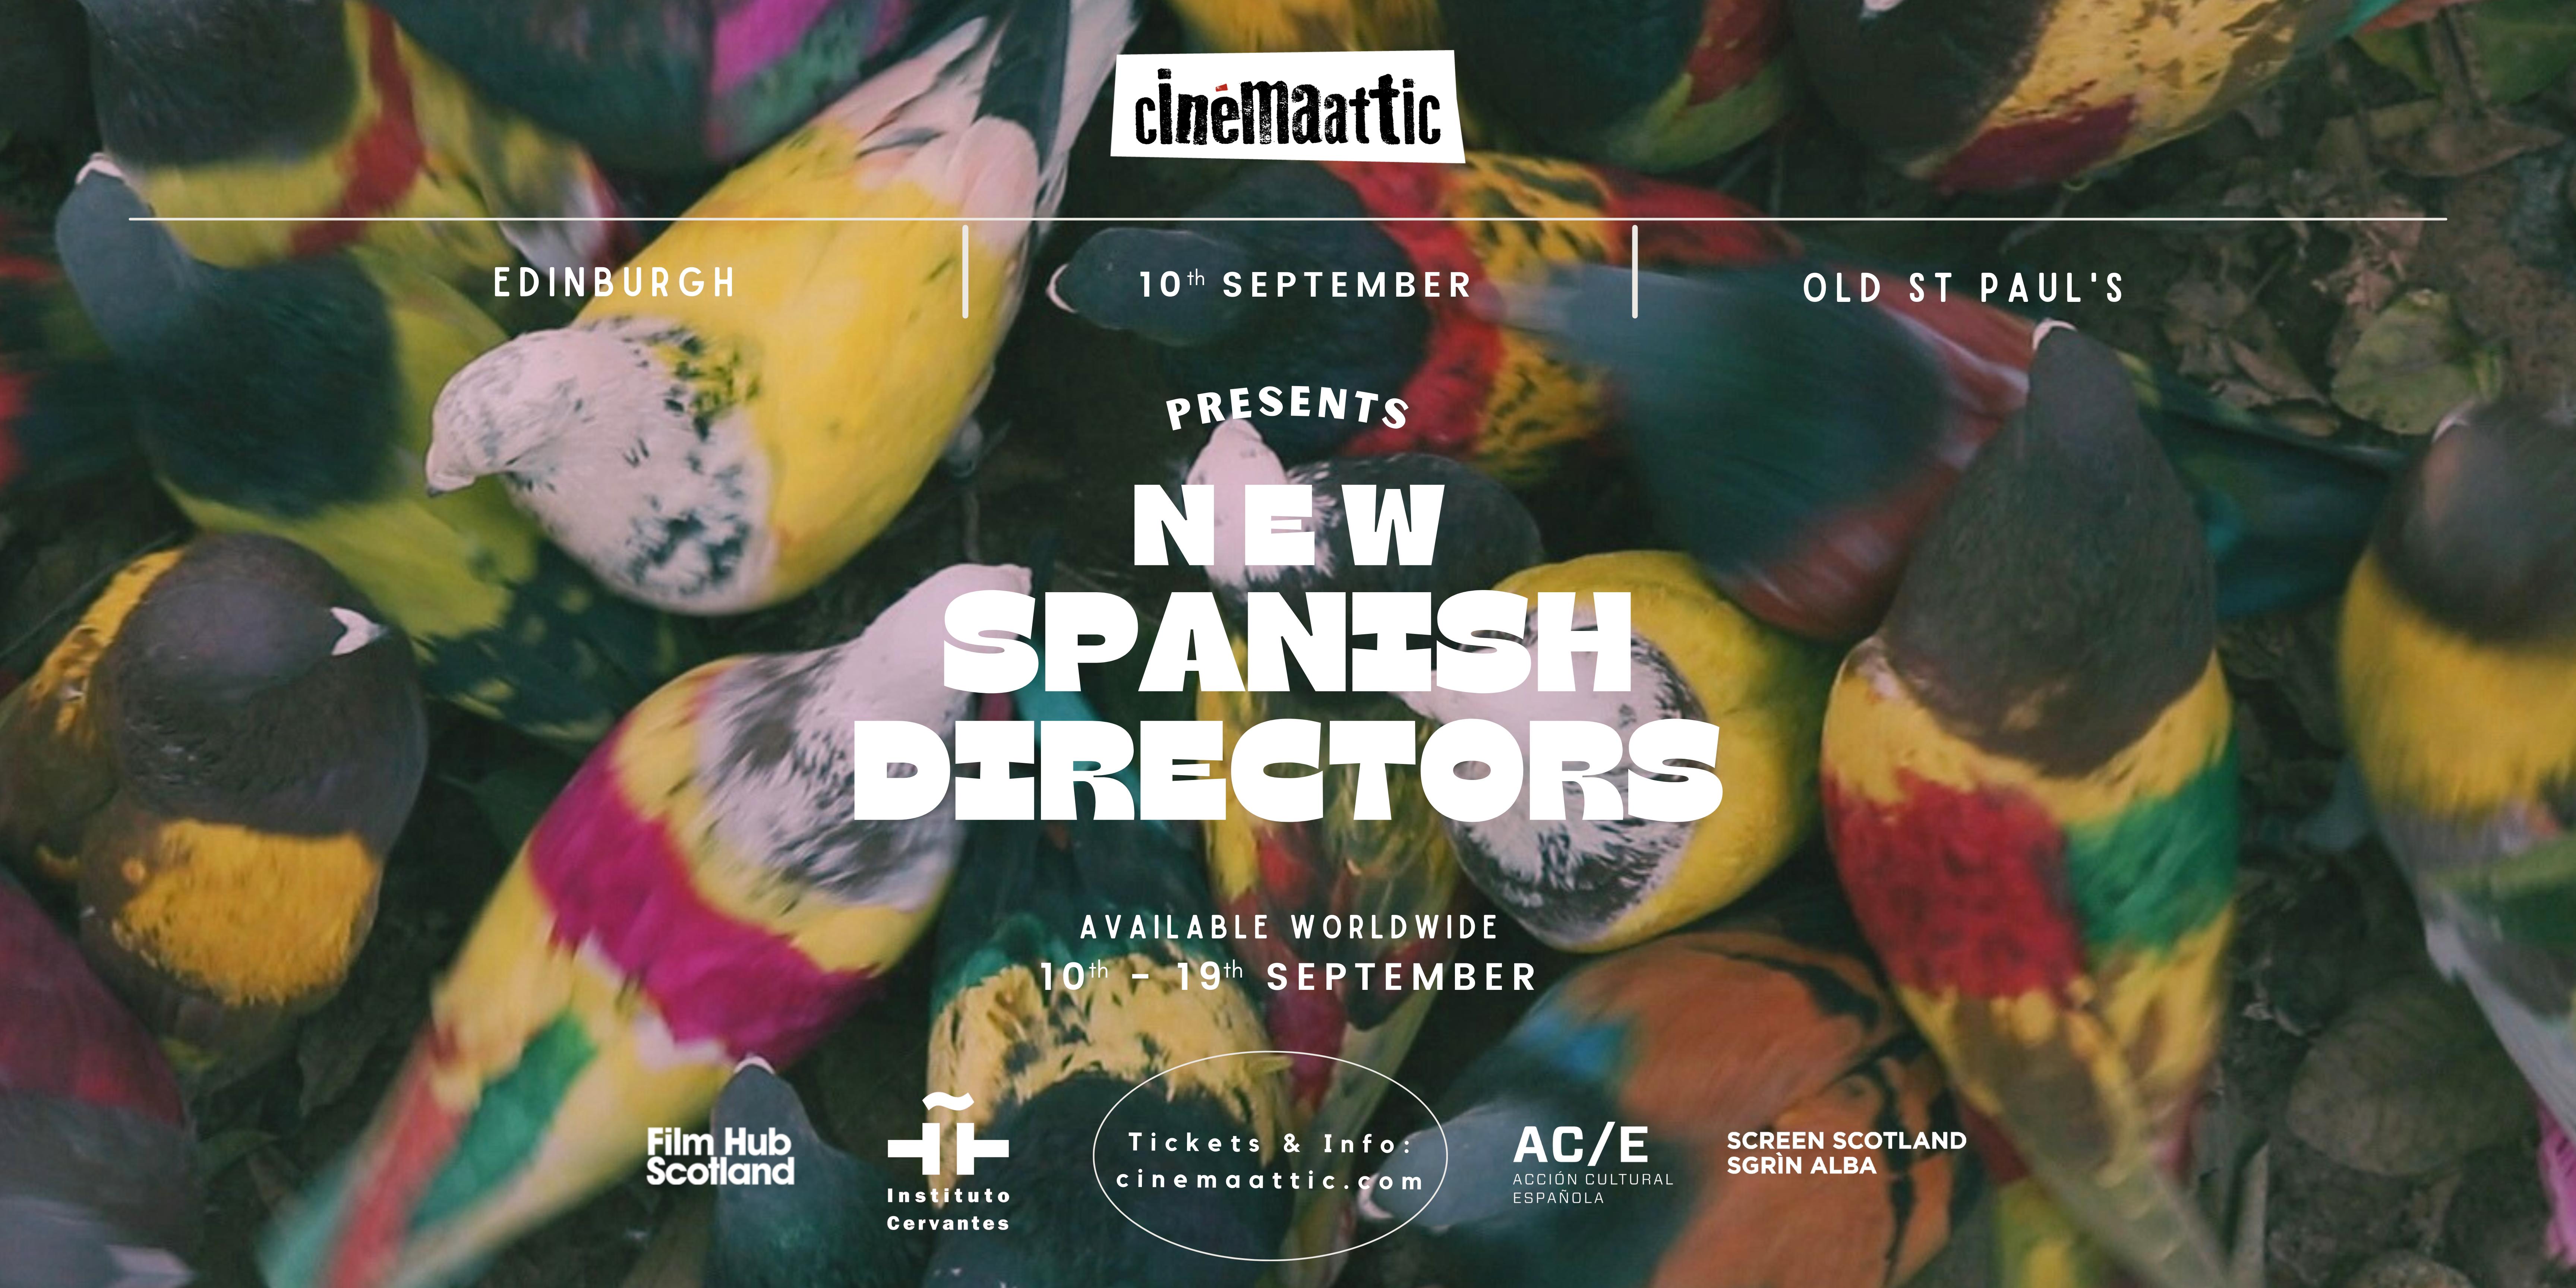 New Spanish Directors banner